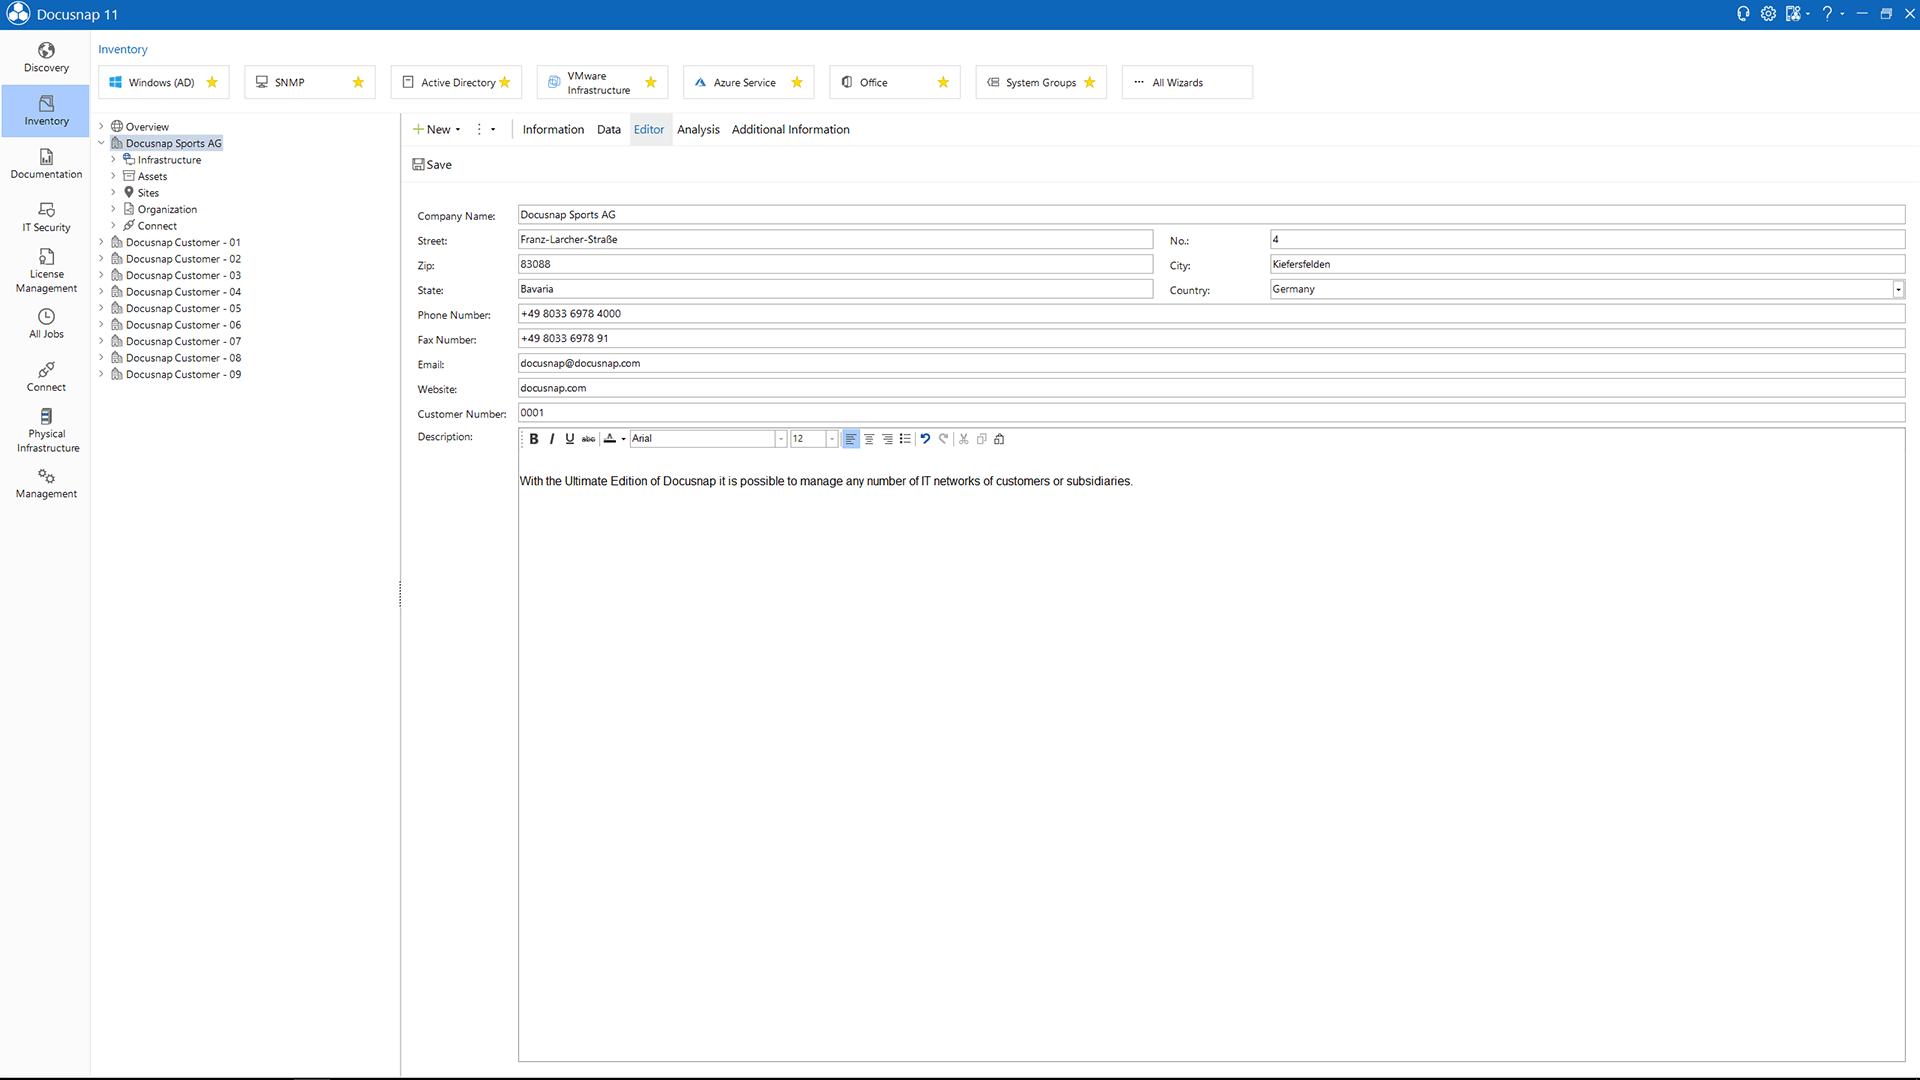 Screenshot: Multi-tenancy of Docusnap